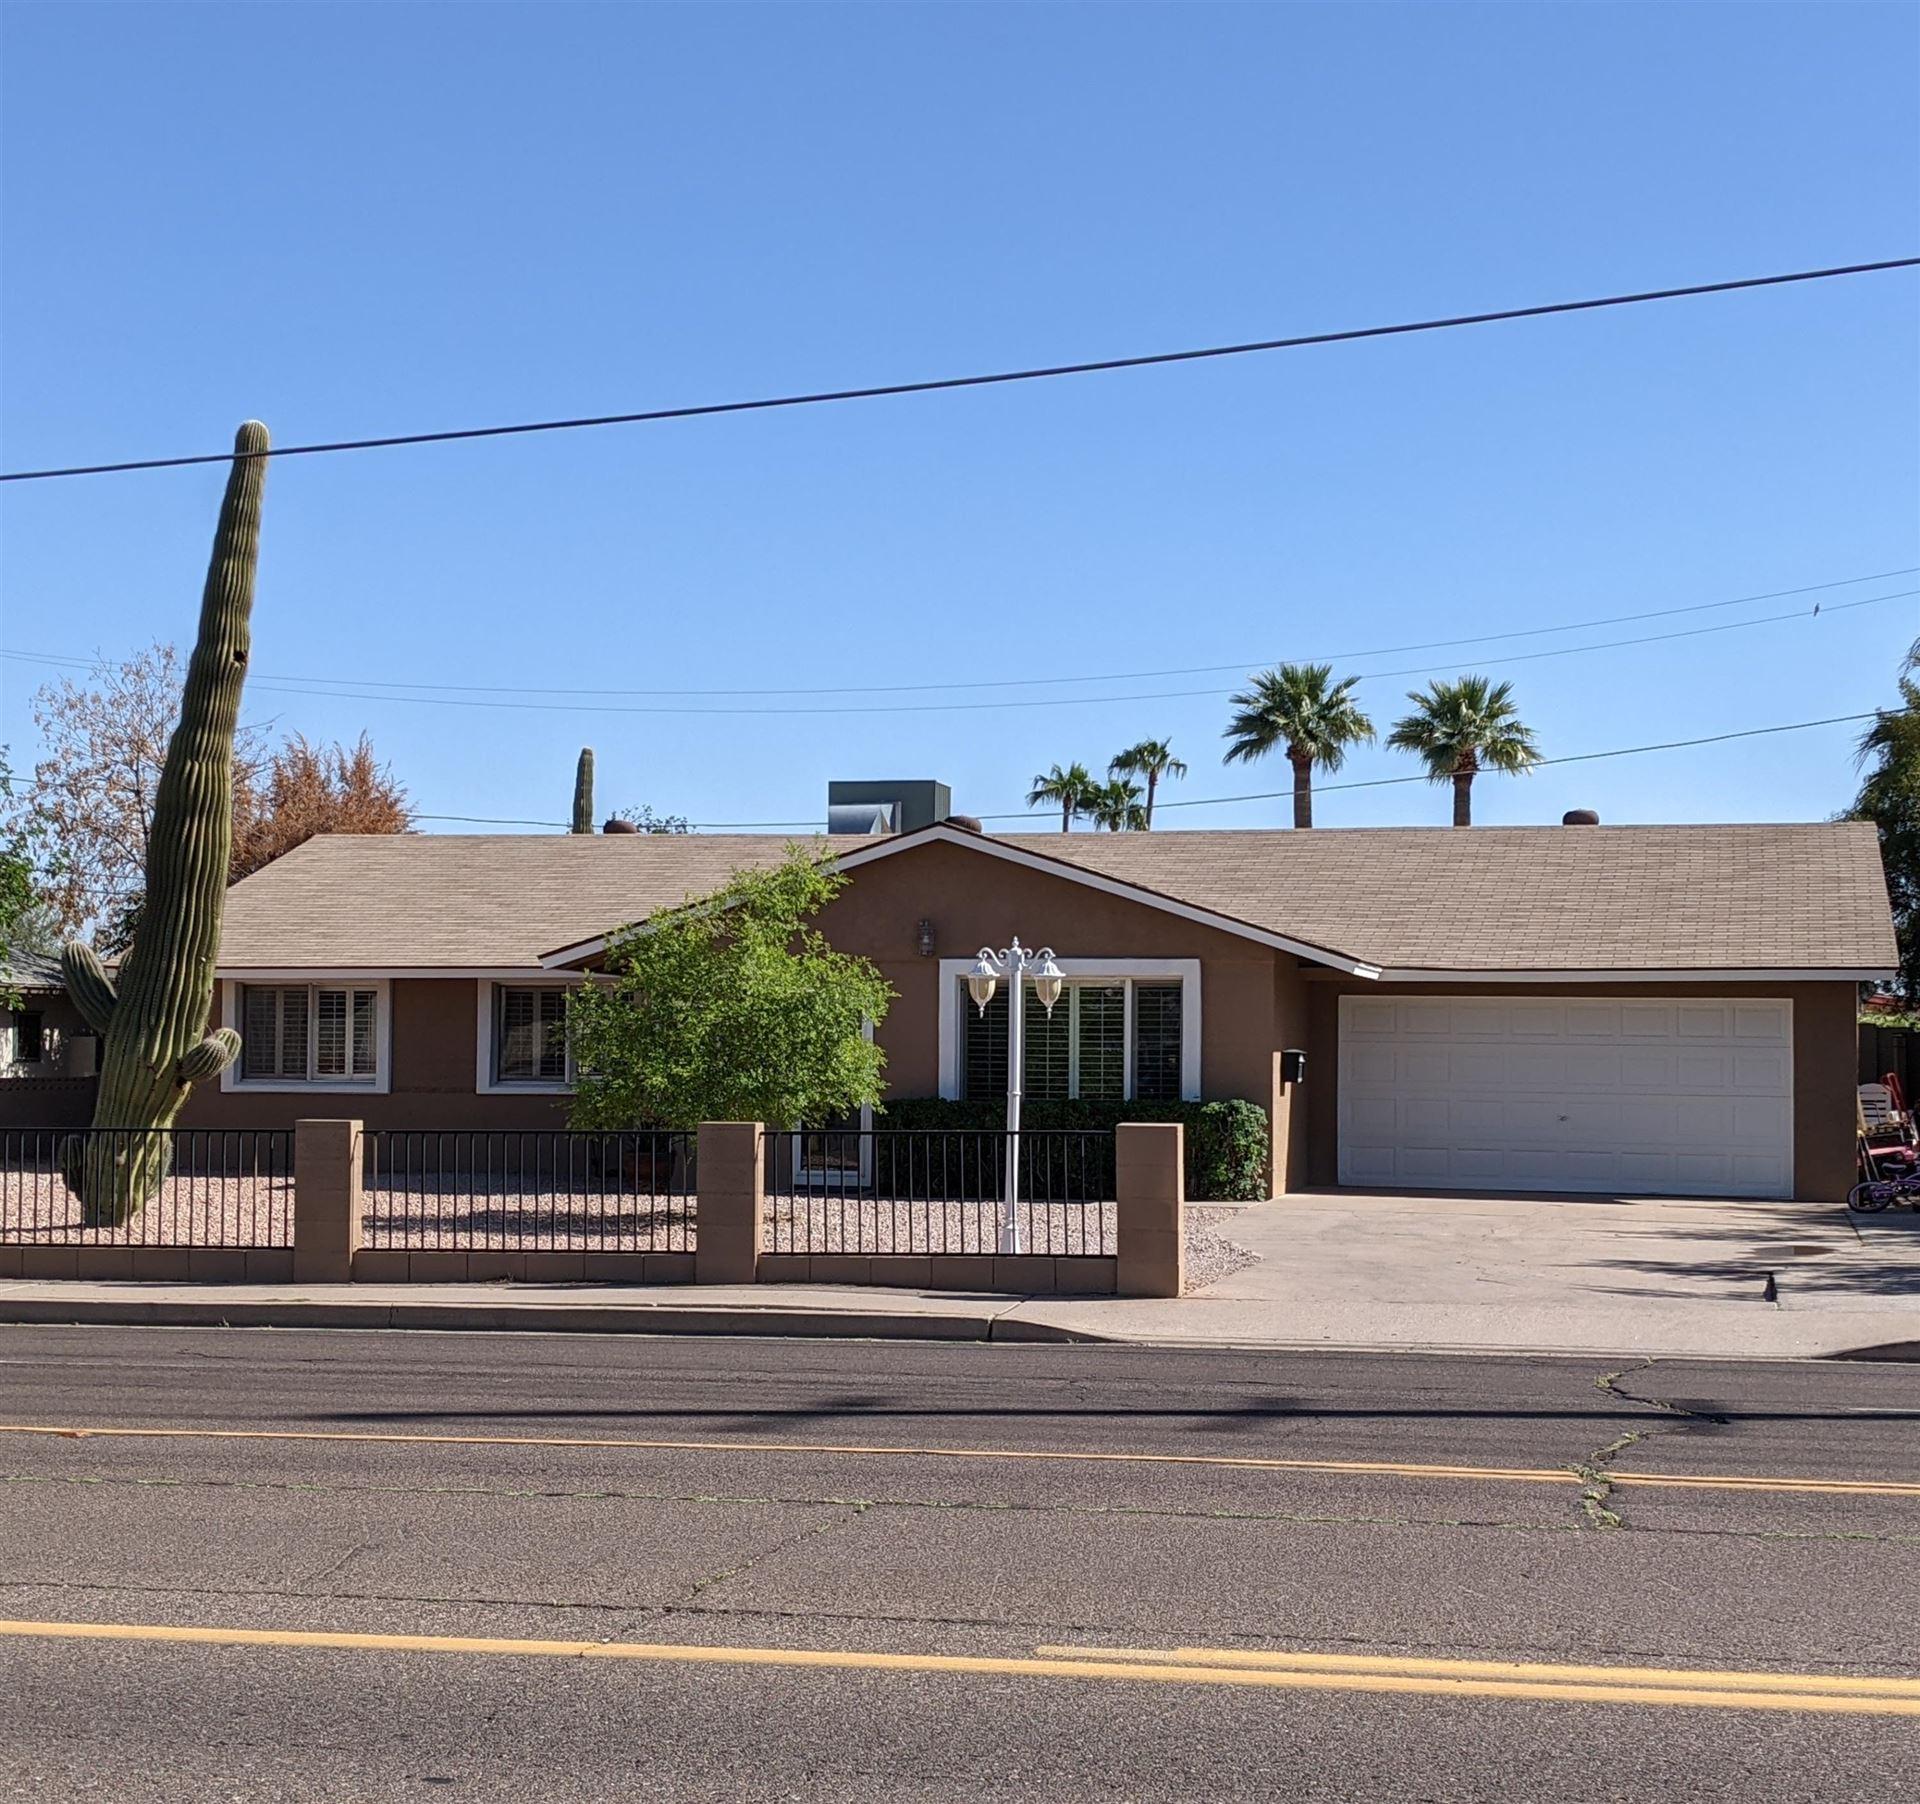 Photo of 603 E MCKELLIPS Road, Tempe, AZ 85281 (MLS # 6231898)